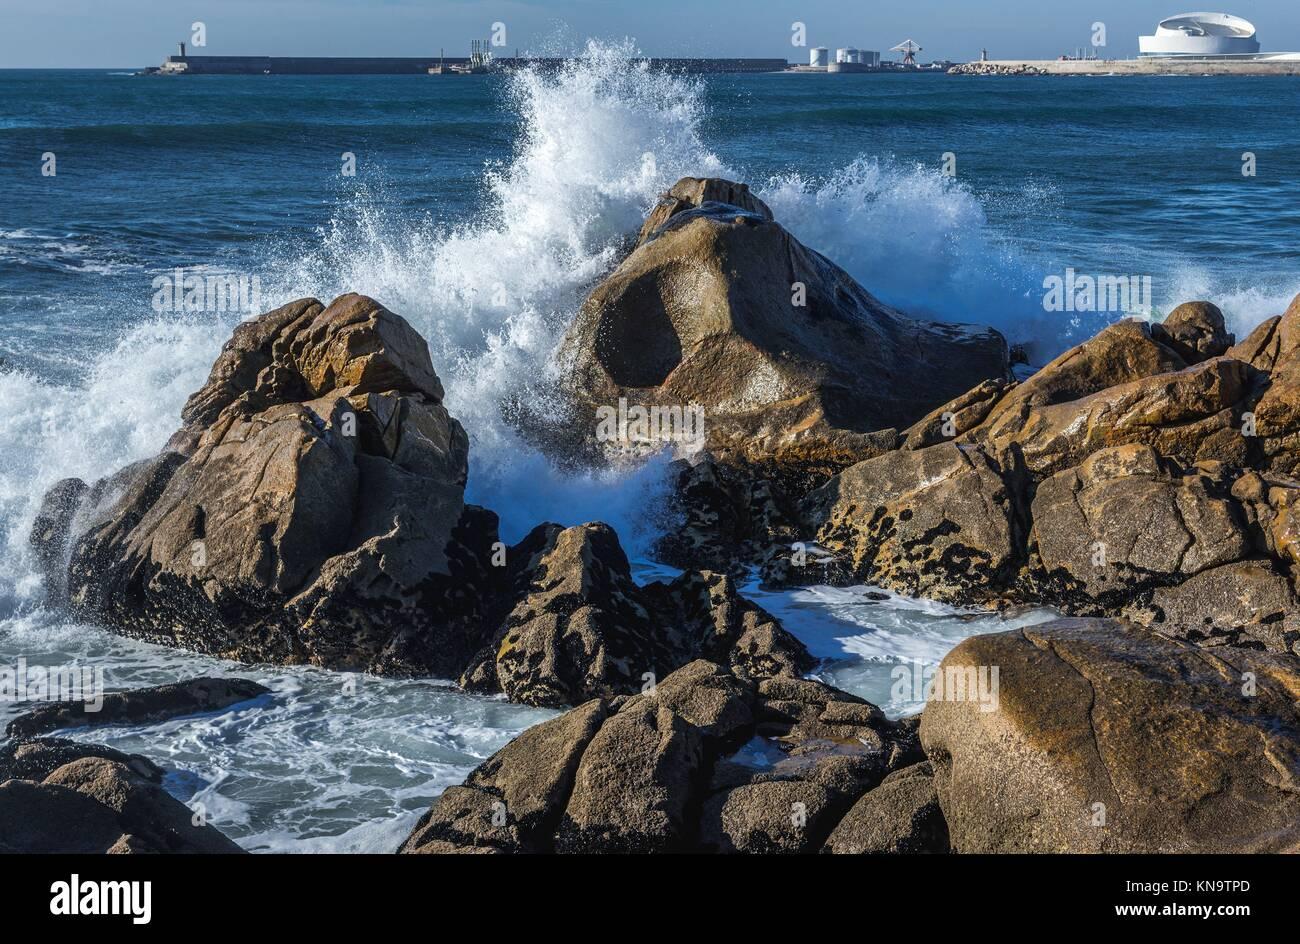 Waves smashing against rocks on the beach in Nevogilde civil parish of Porto, Portugal. Port of Leixoes Cruise Terminal - Stock Image